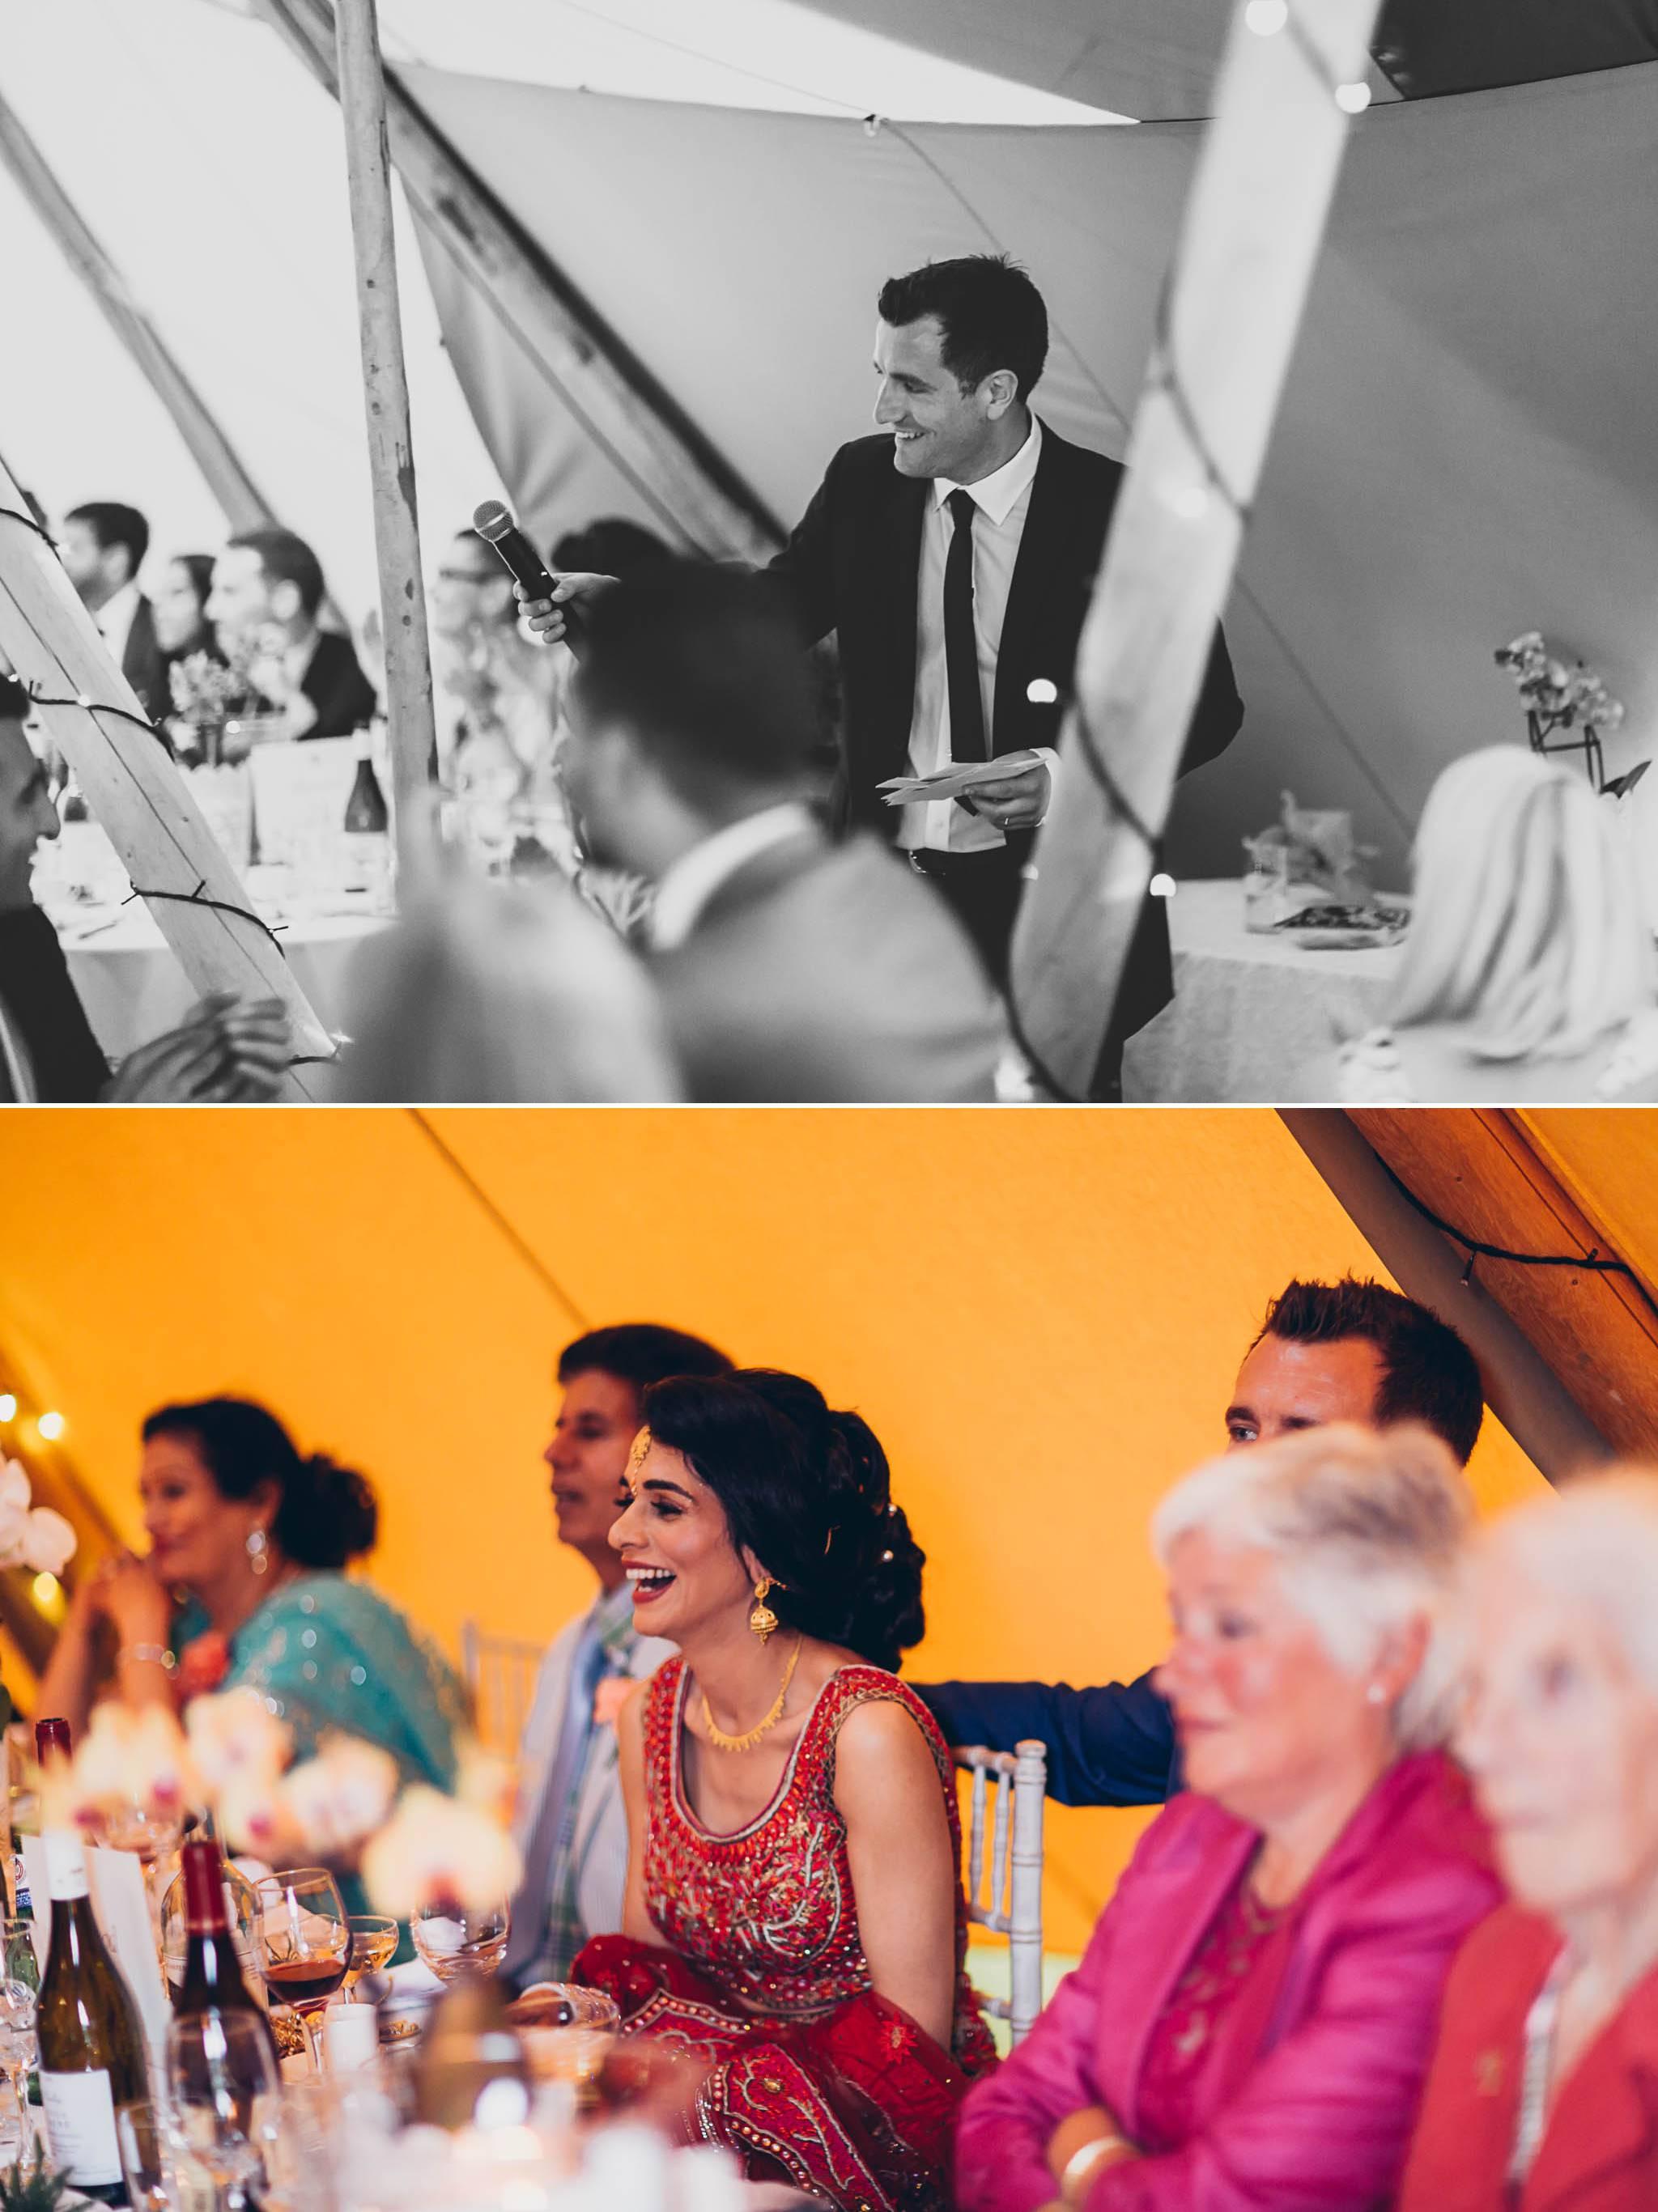 wedding-photographer-staffordshire 29.jpg